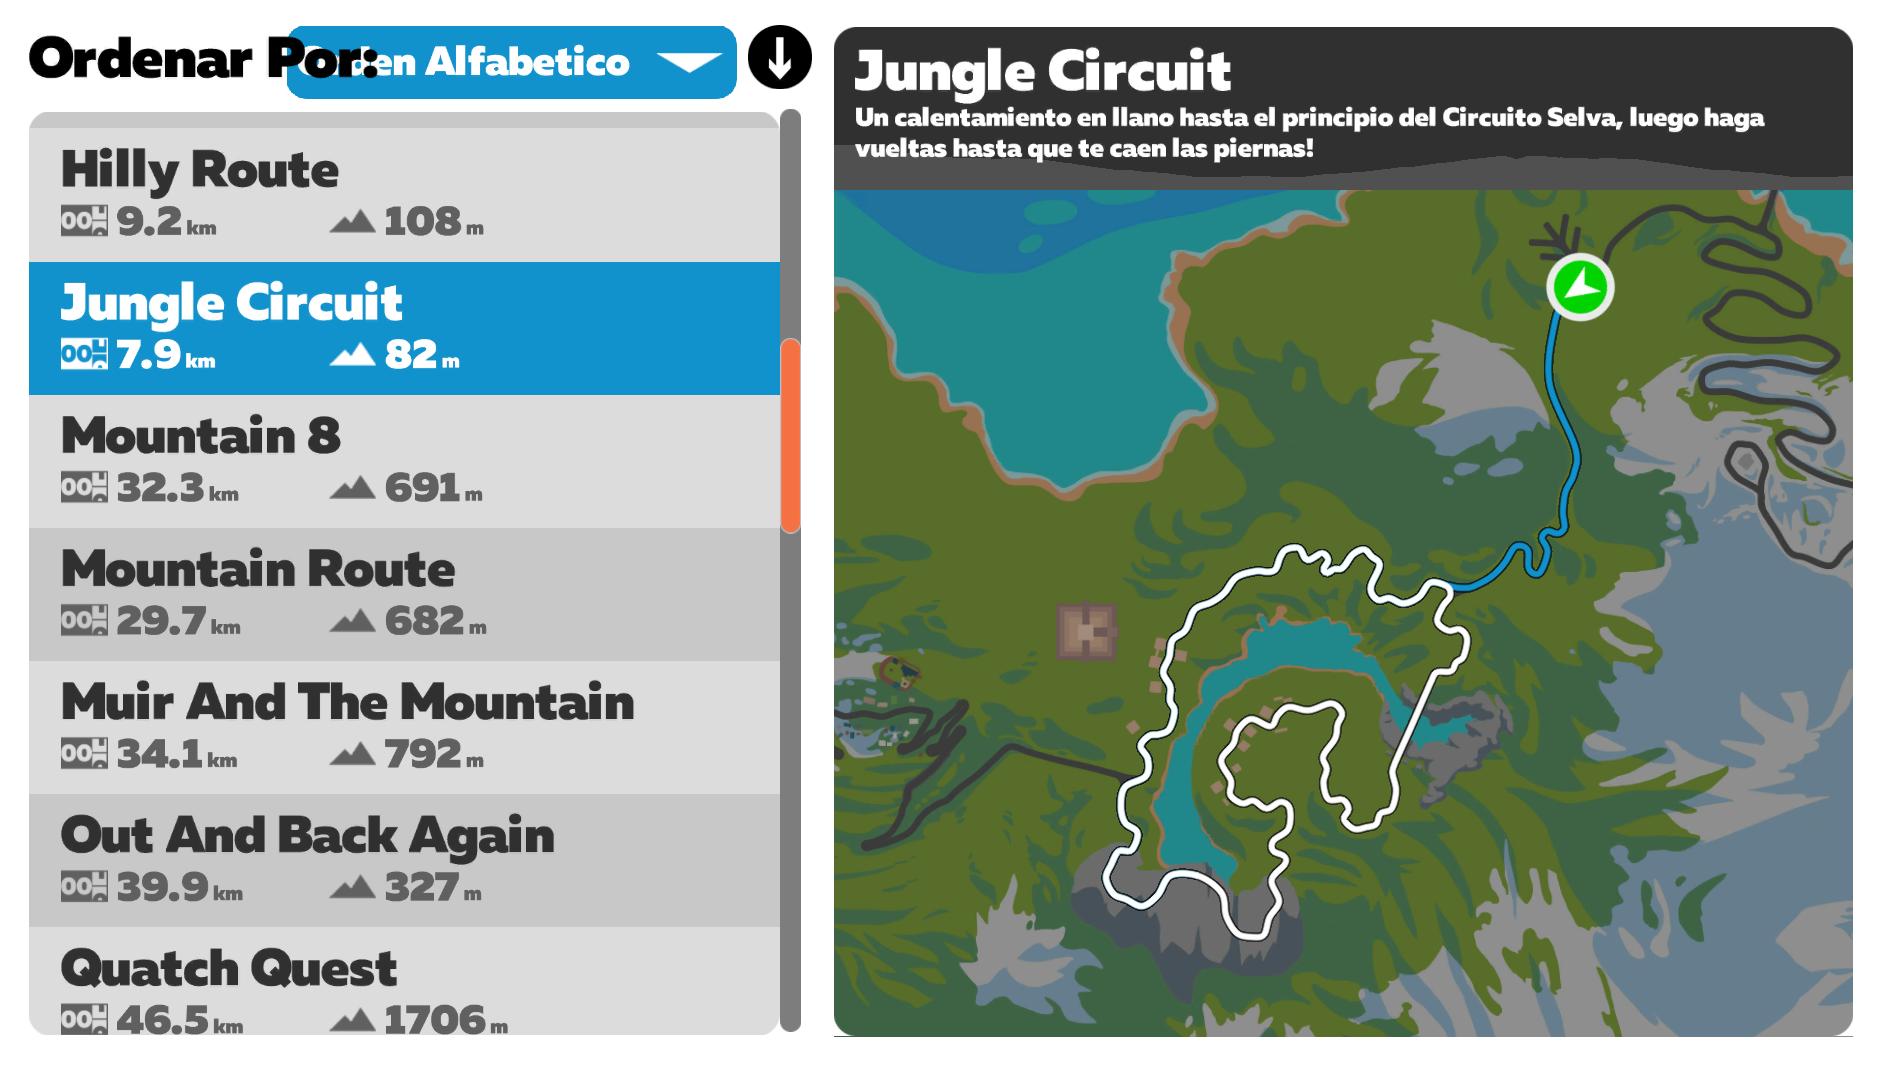 Ruta zwift Jungle Circuit